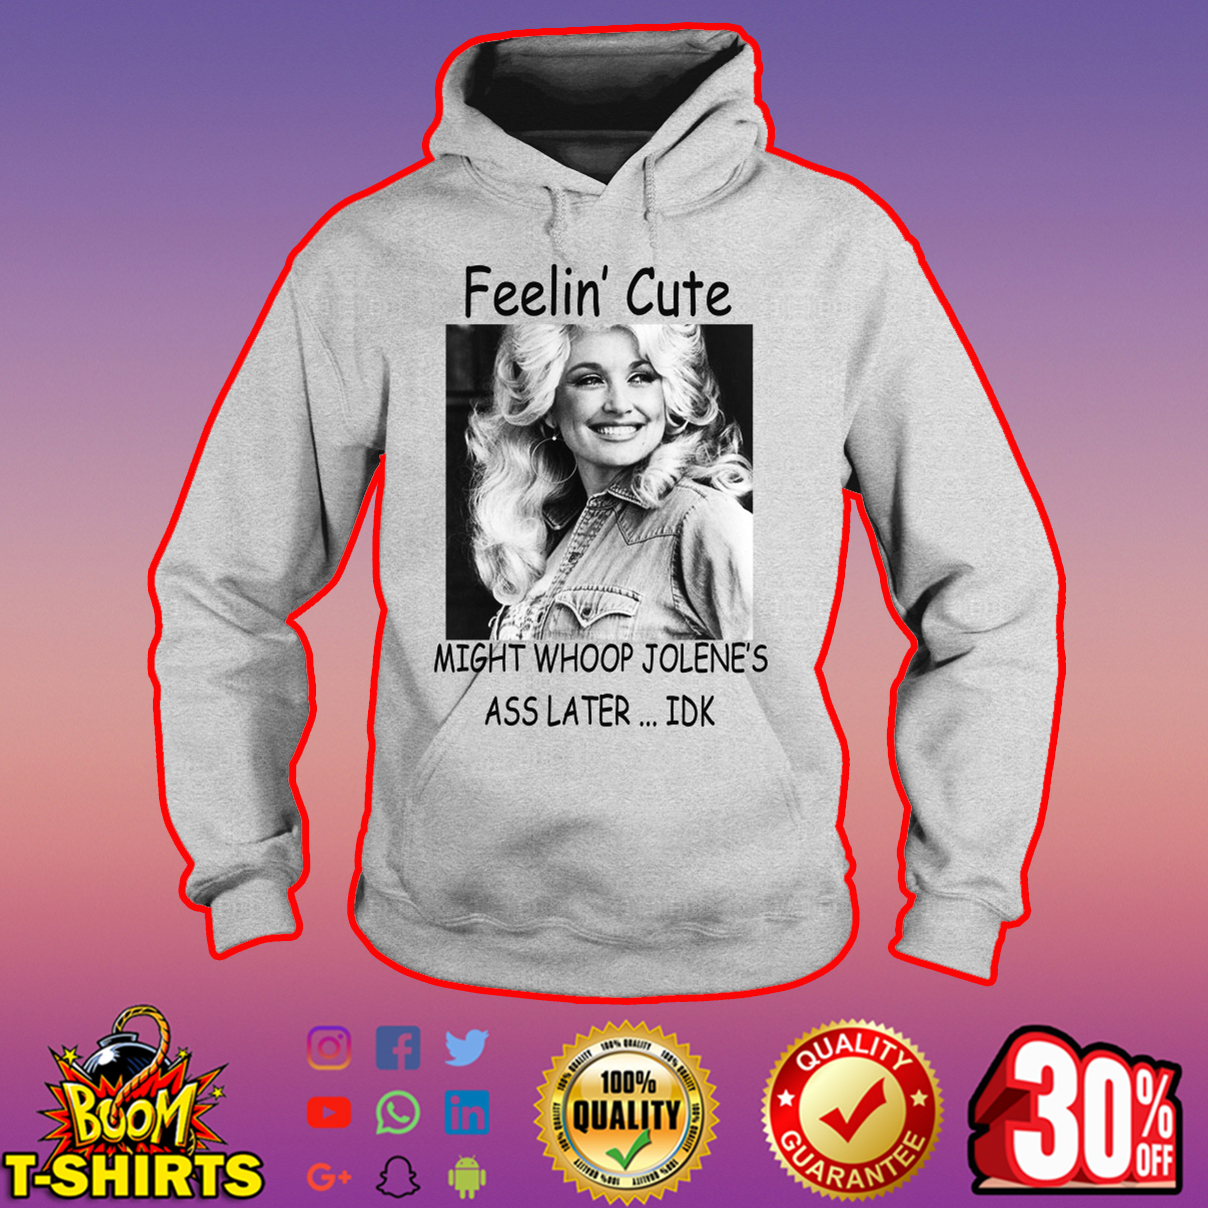 Dolly Parton Feelin' cute might whoop jolene's ass later IDK hoodie